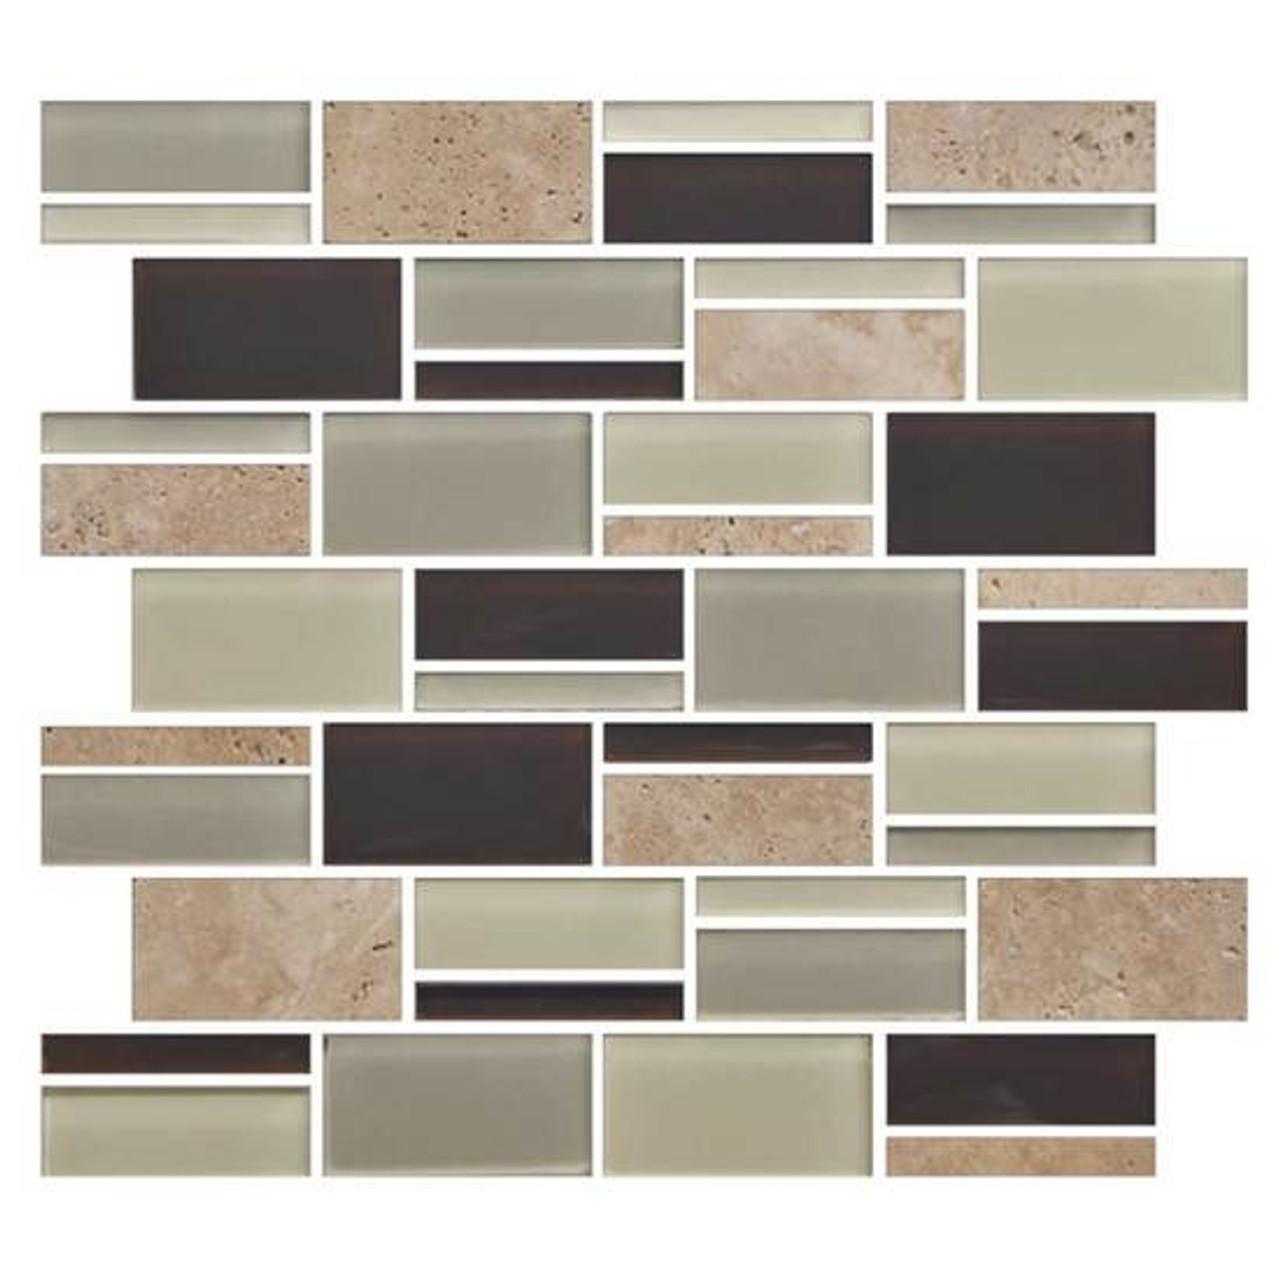 american olean color appeal blends c138 canyon trail blend 3 x random interlocking glass stone mosaic tile sample